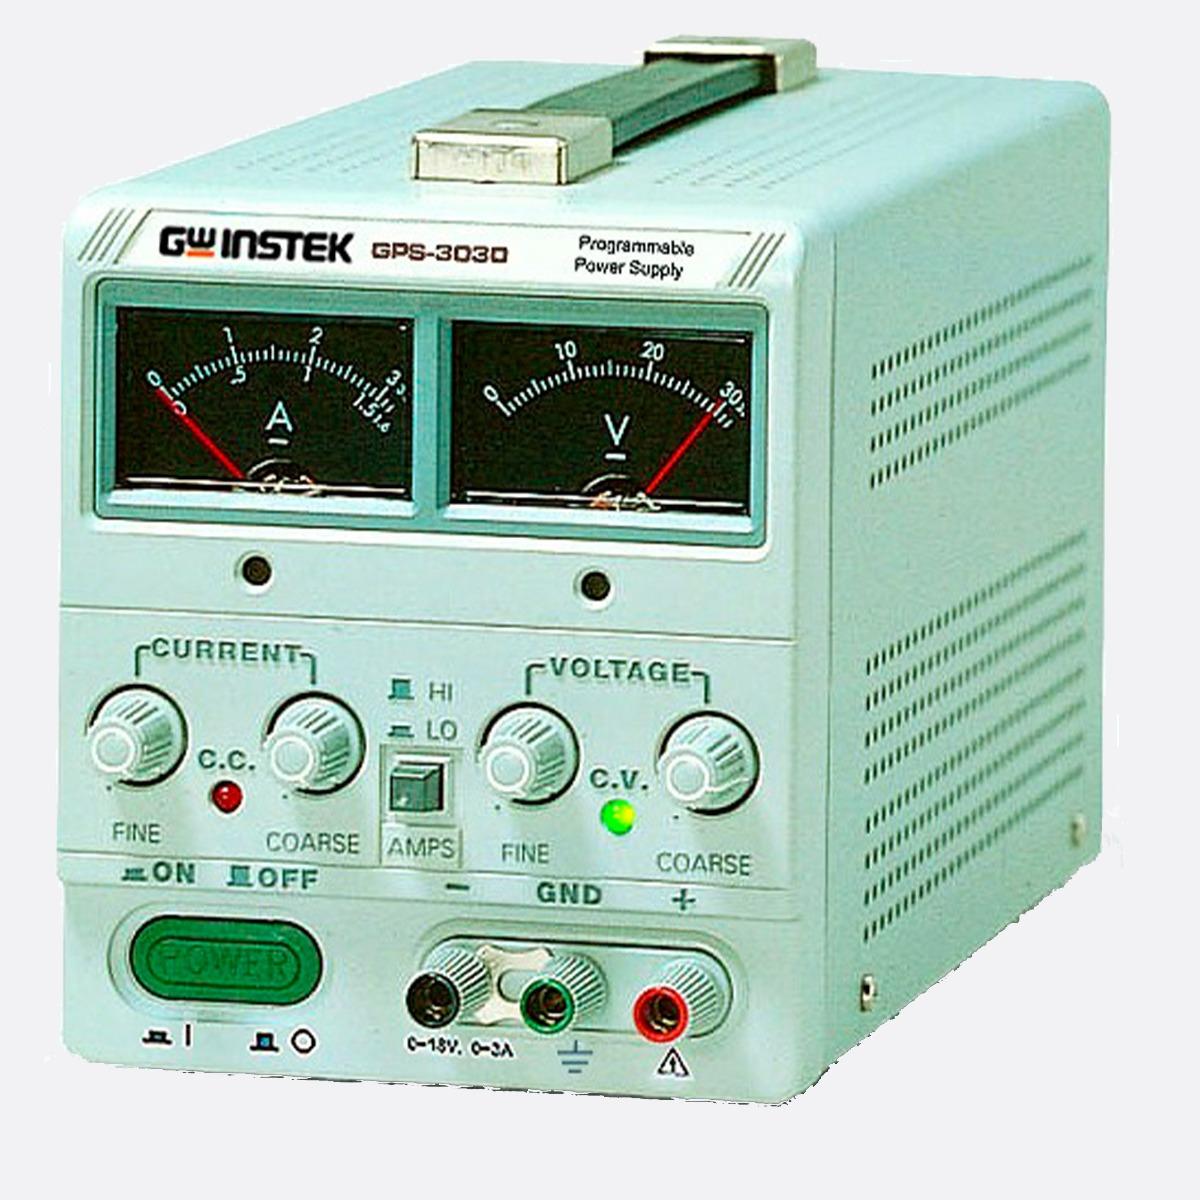 GWInstek_GPS-3030_front_Ccontrols